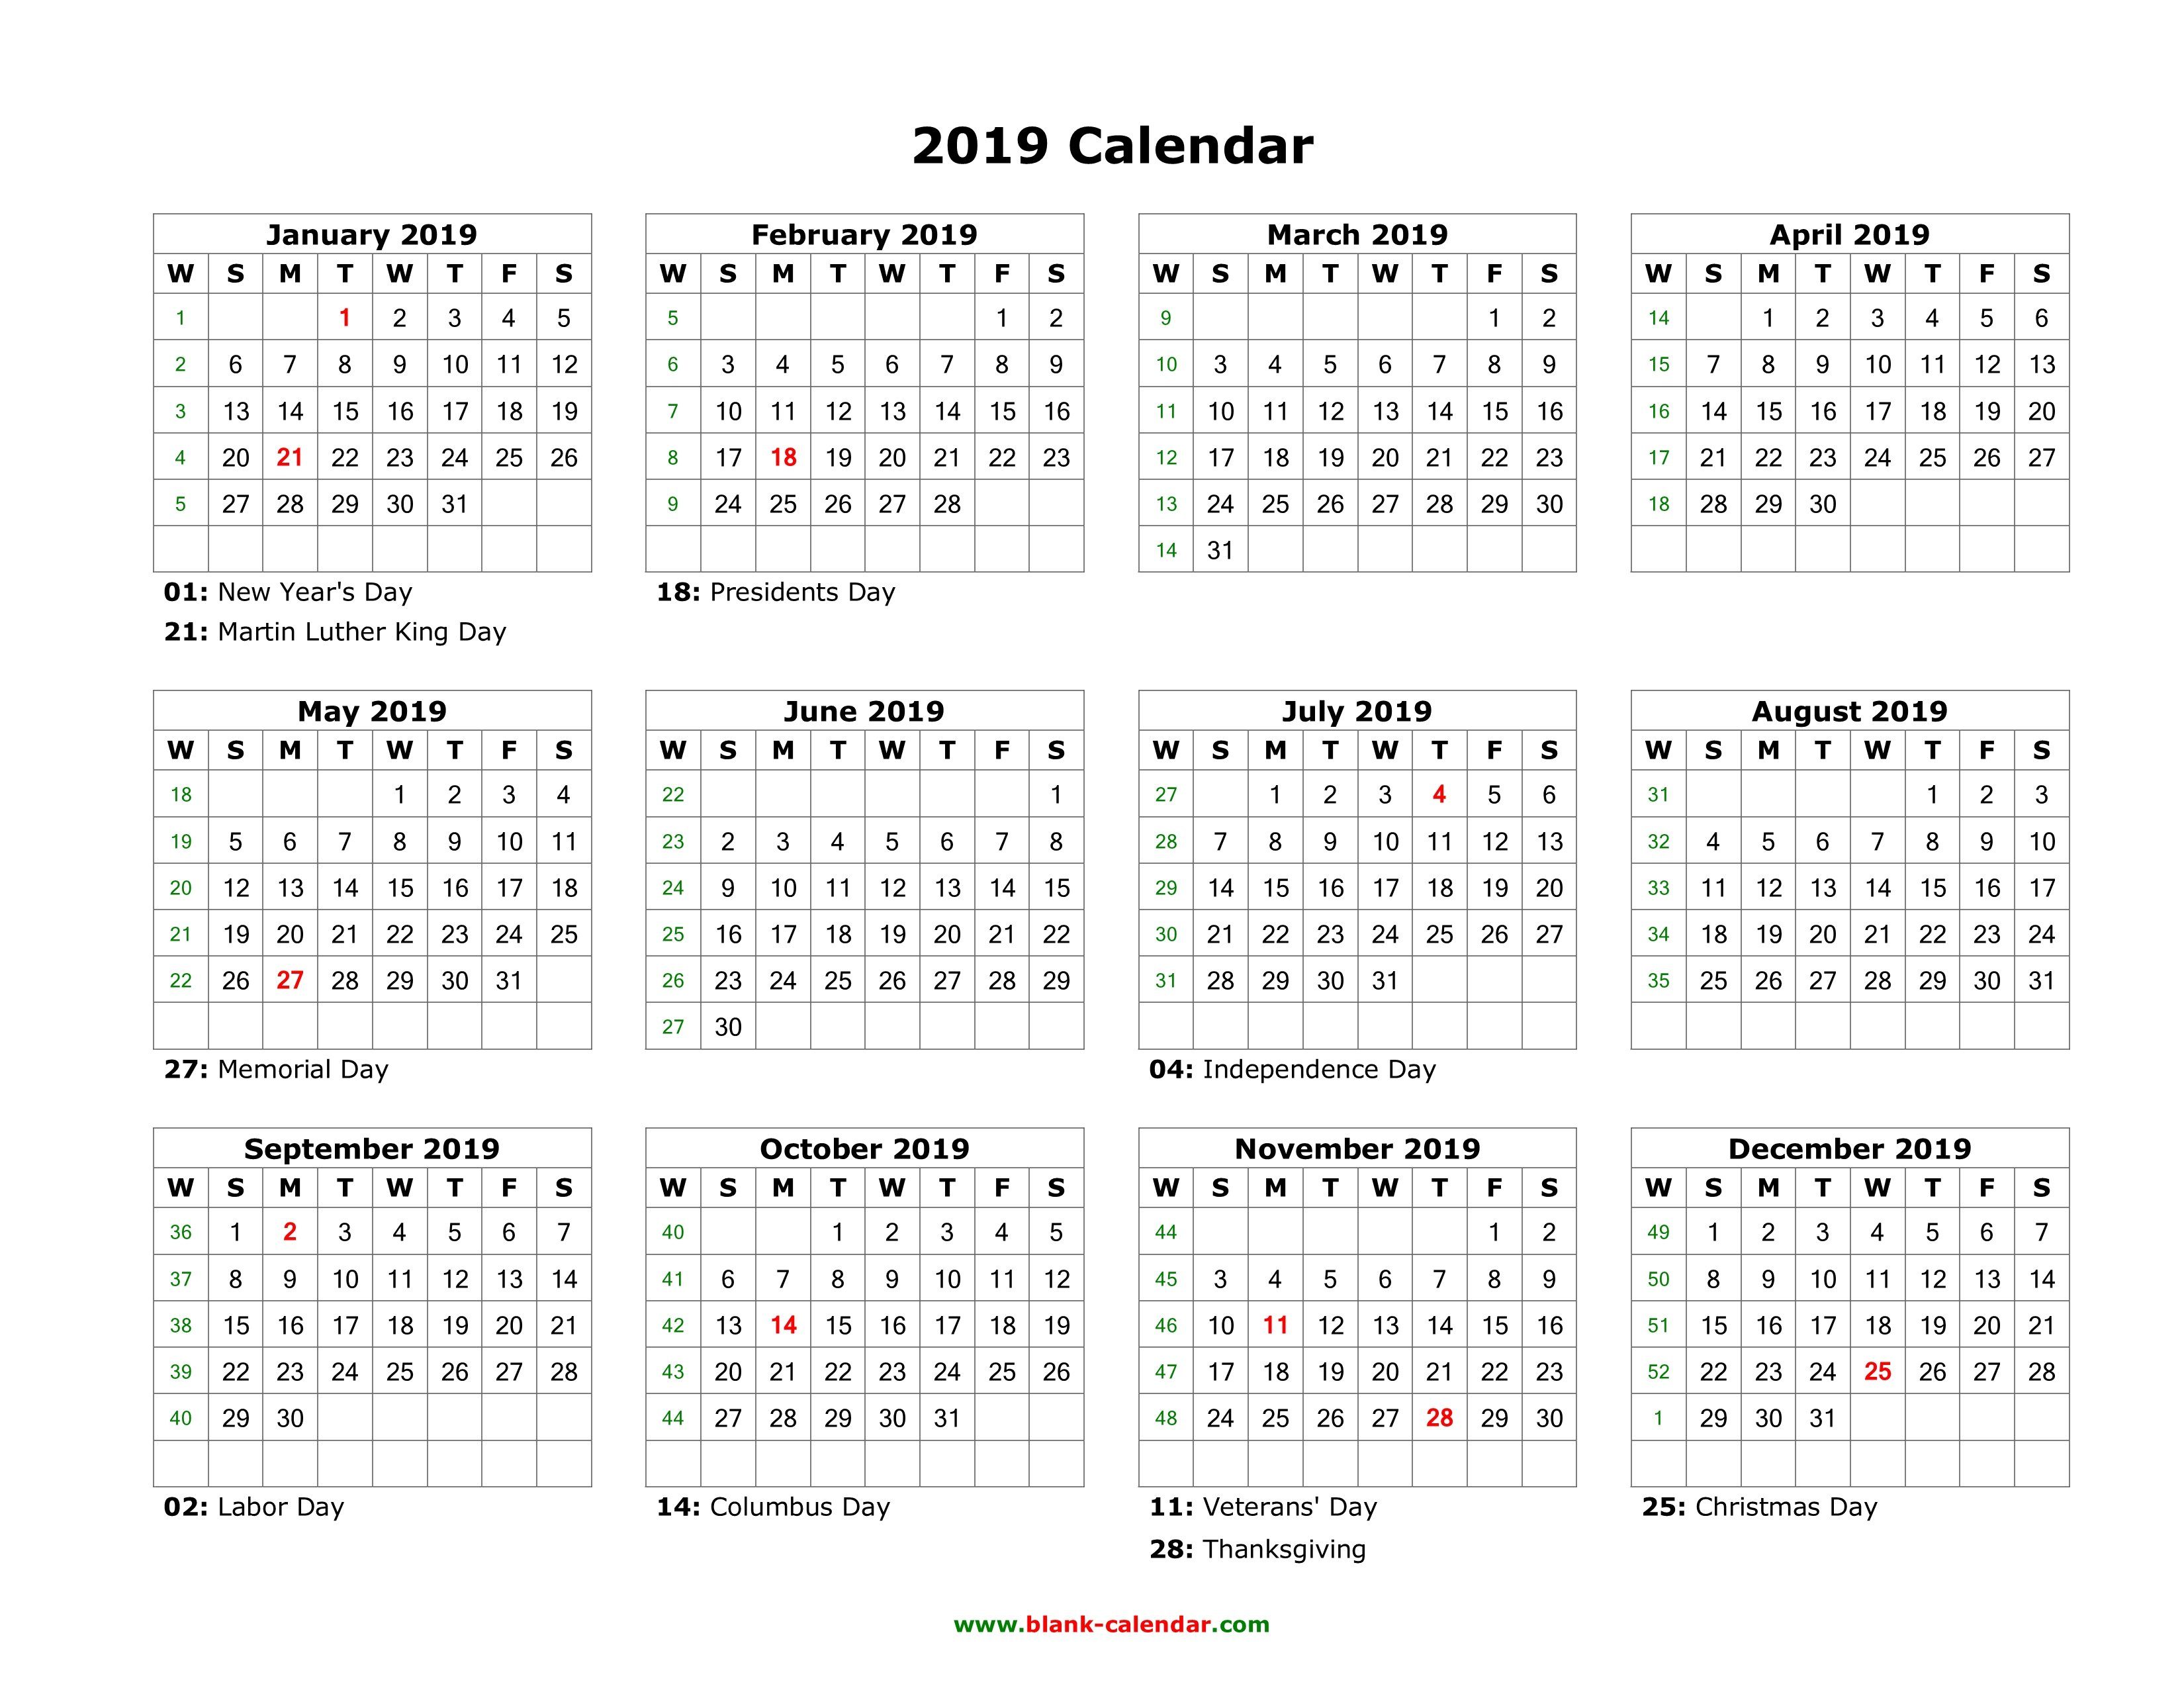 Blank Calendar 2019 | Free Download Calendar Templates Calendar 2019 Romana